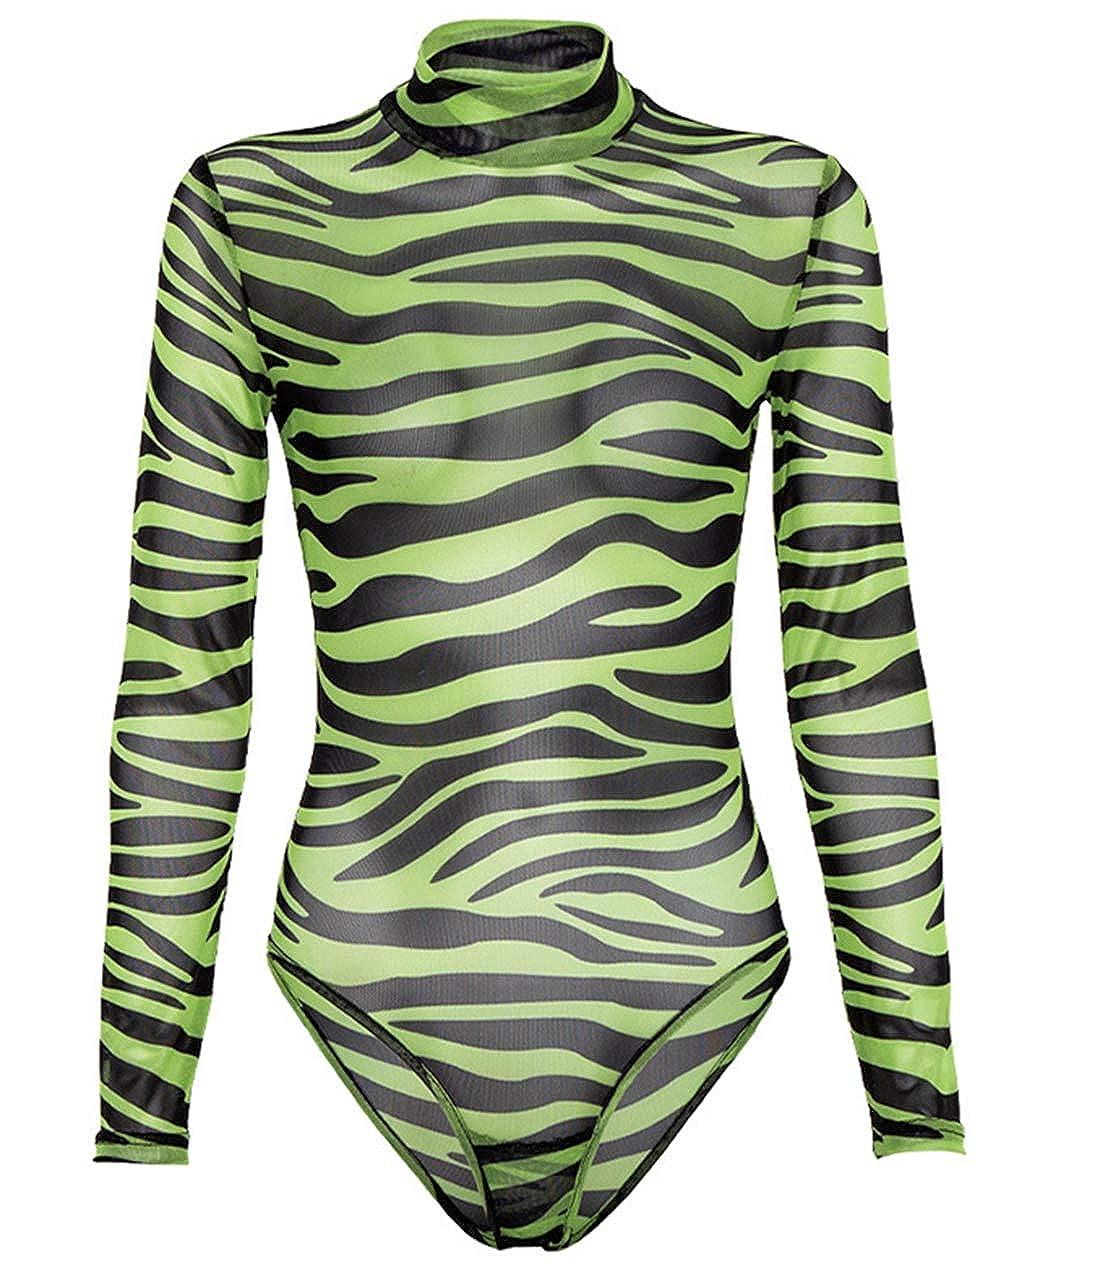 Damen Bodysuit Strampler mit Animal-Print Bodys Tops Overalls Jumpsuit Lang/ärmliges Figurbetontes Oberteil Trikot mit Schlangenmuster